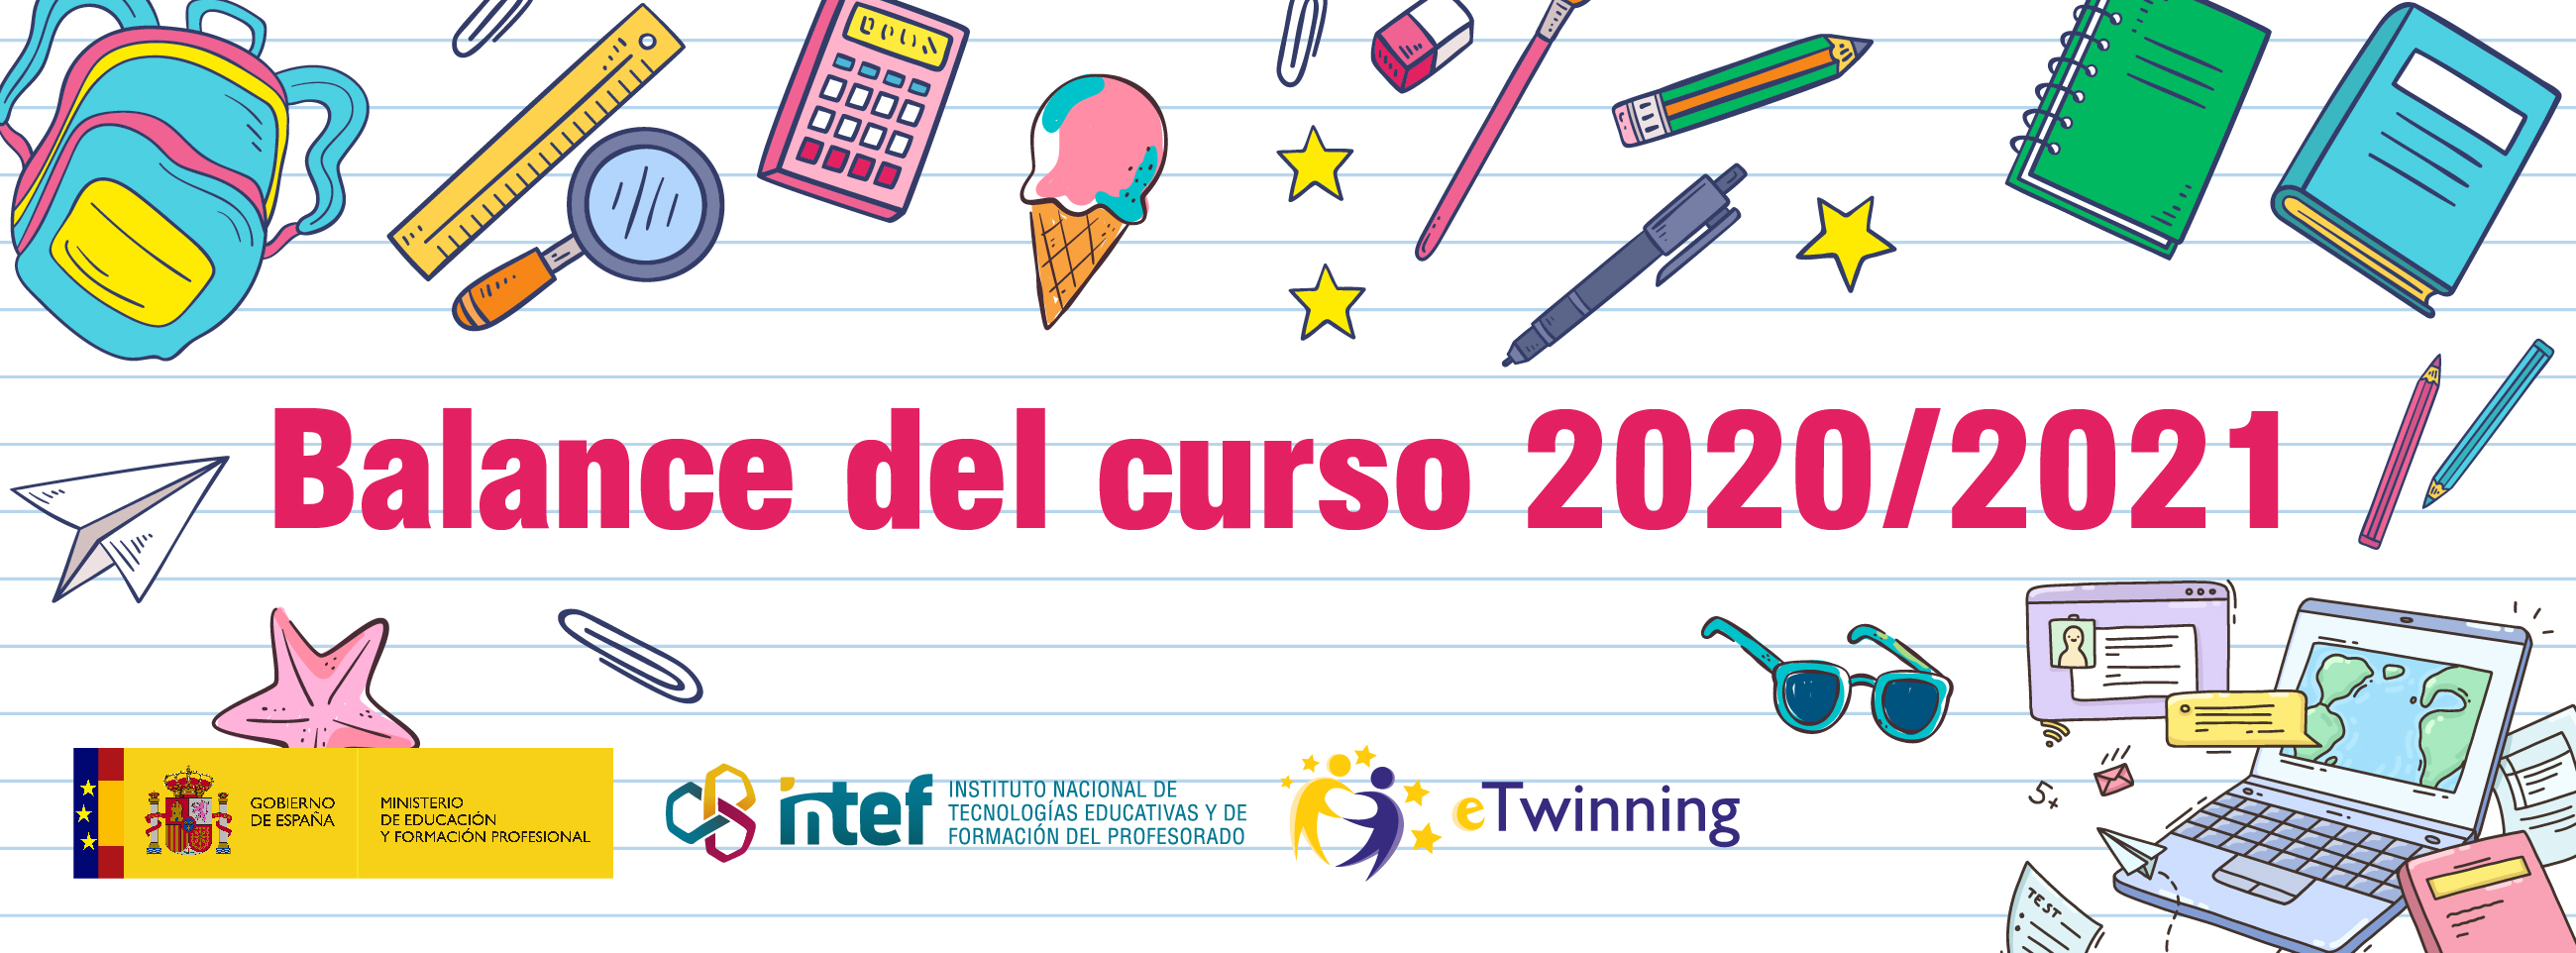 Balance eTwinning curso 2020/2021